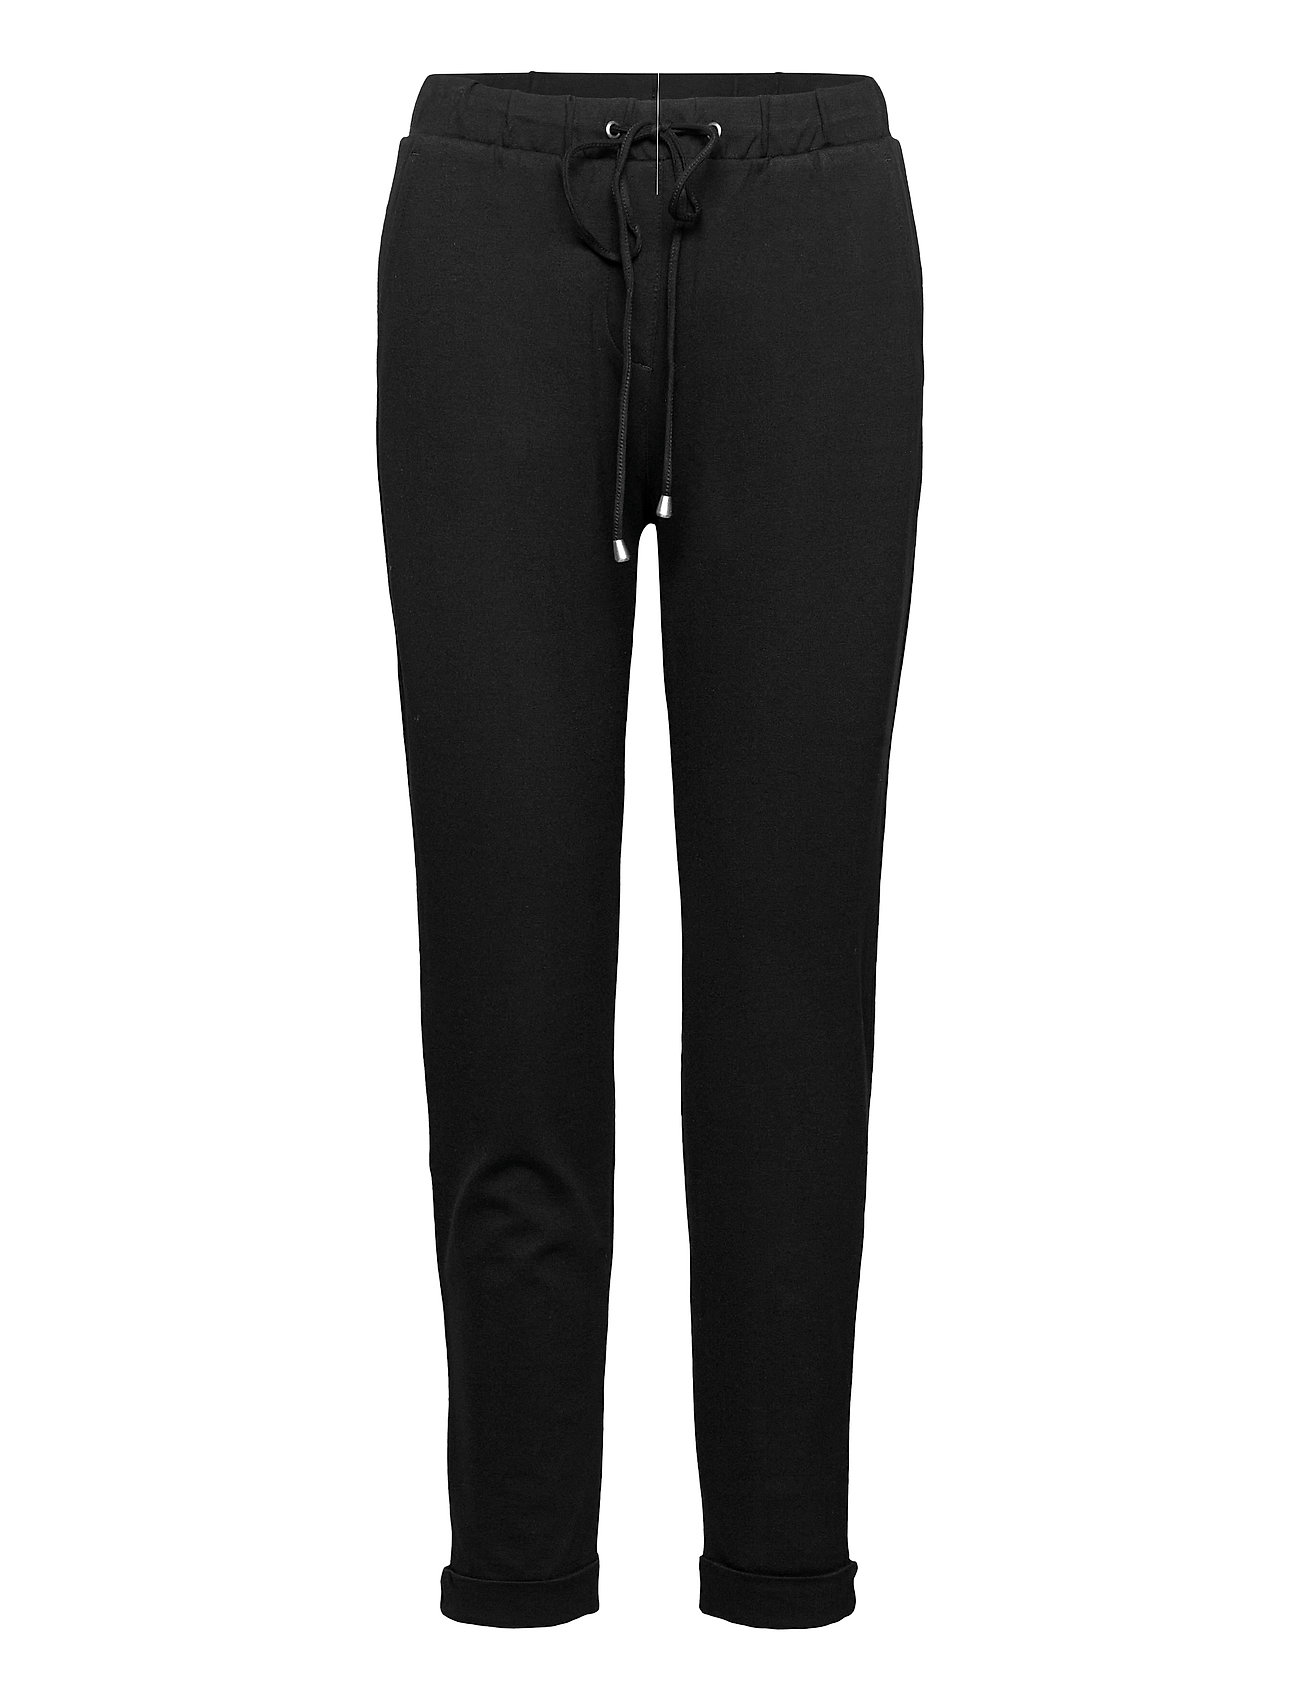 Image of Pants Woven Casual Bukser Sort Esprit Casual (3486935669)